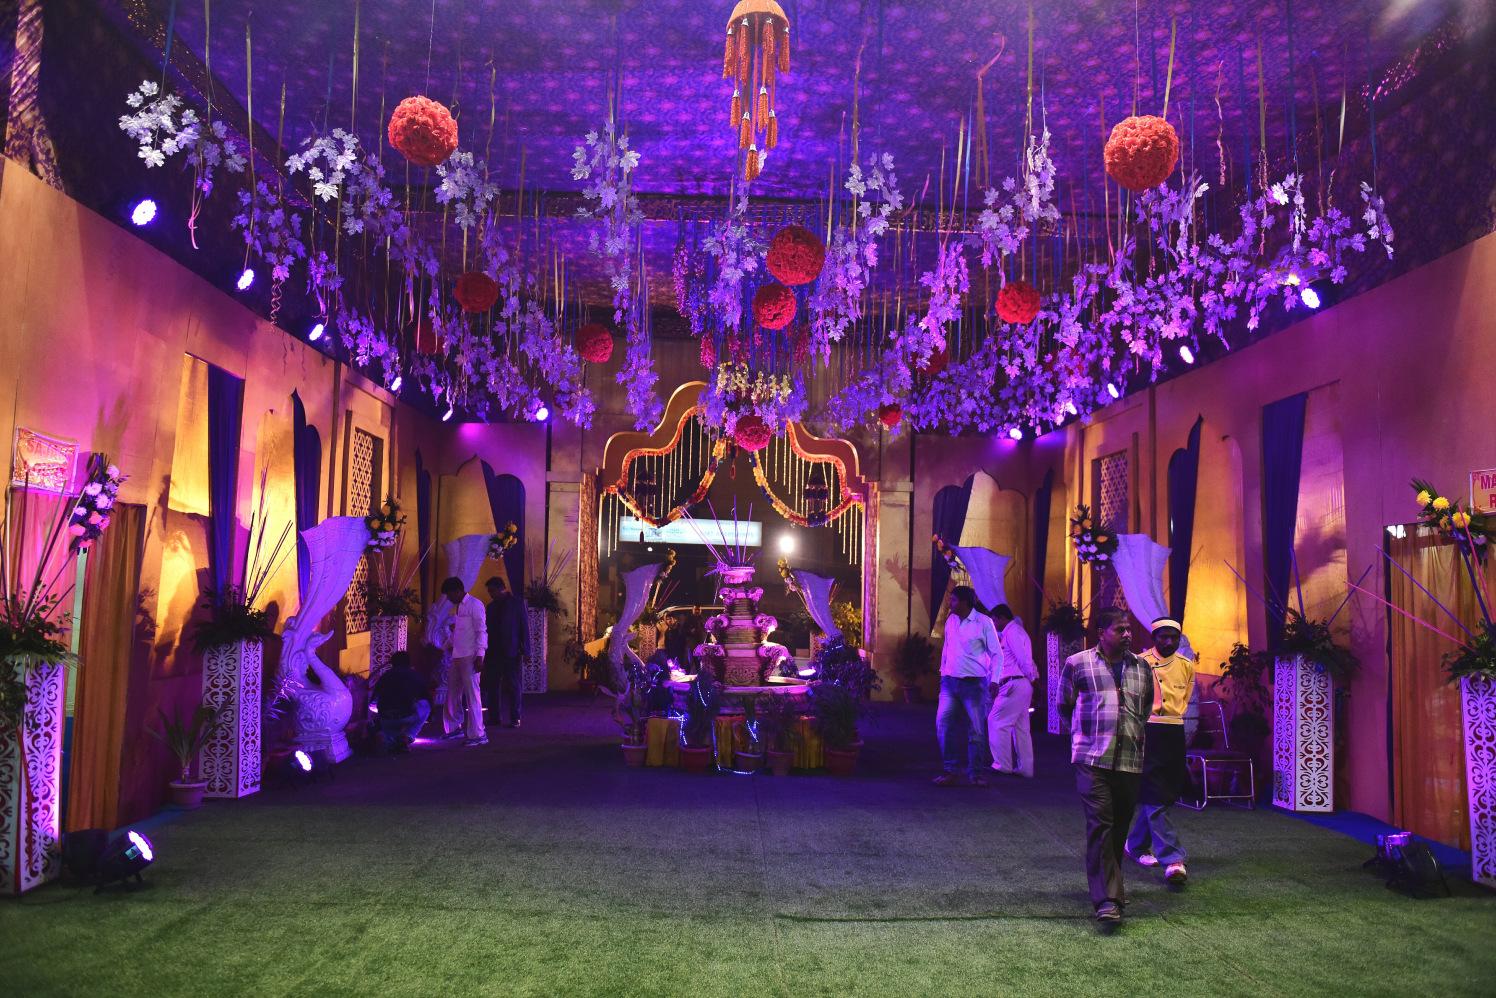 Magnificent Wedding Venue Decor by Himanshu Chauhan Wedding-decor   Weddings Photos & Ideas